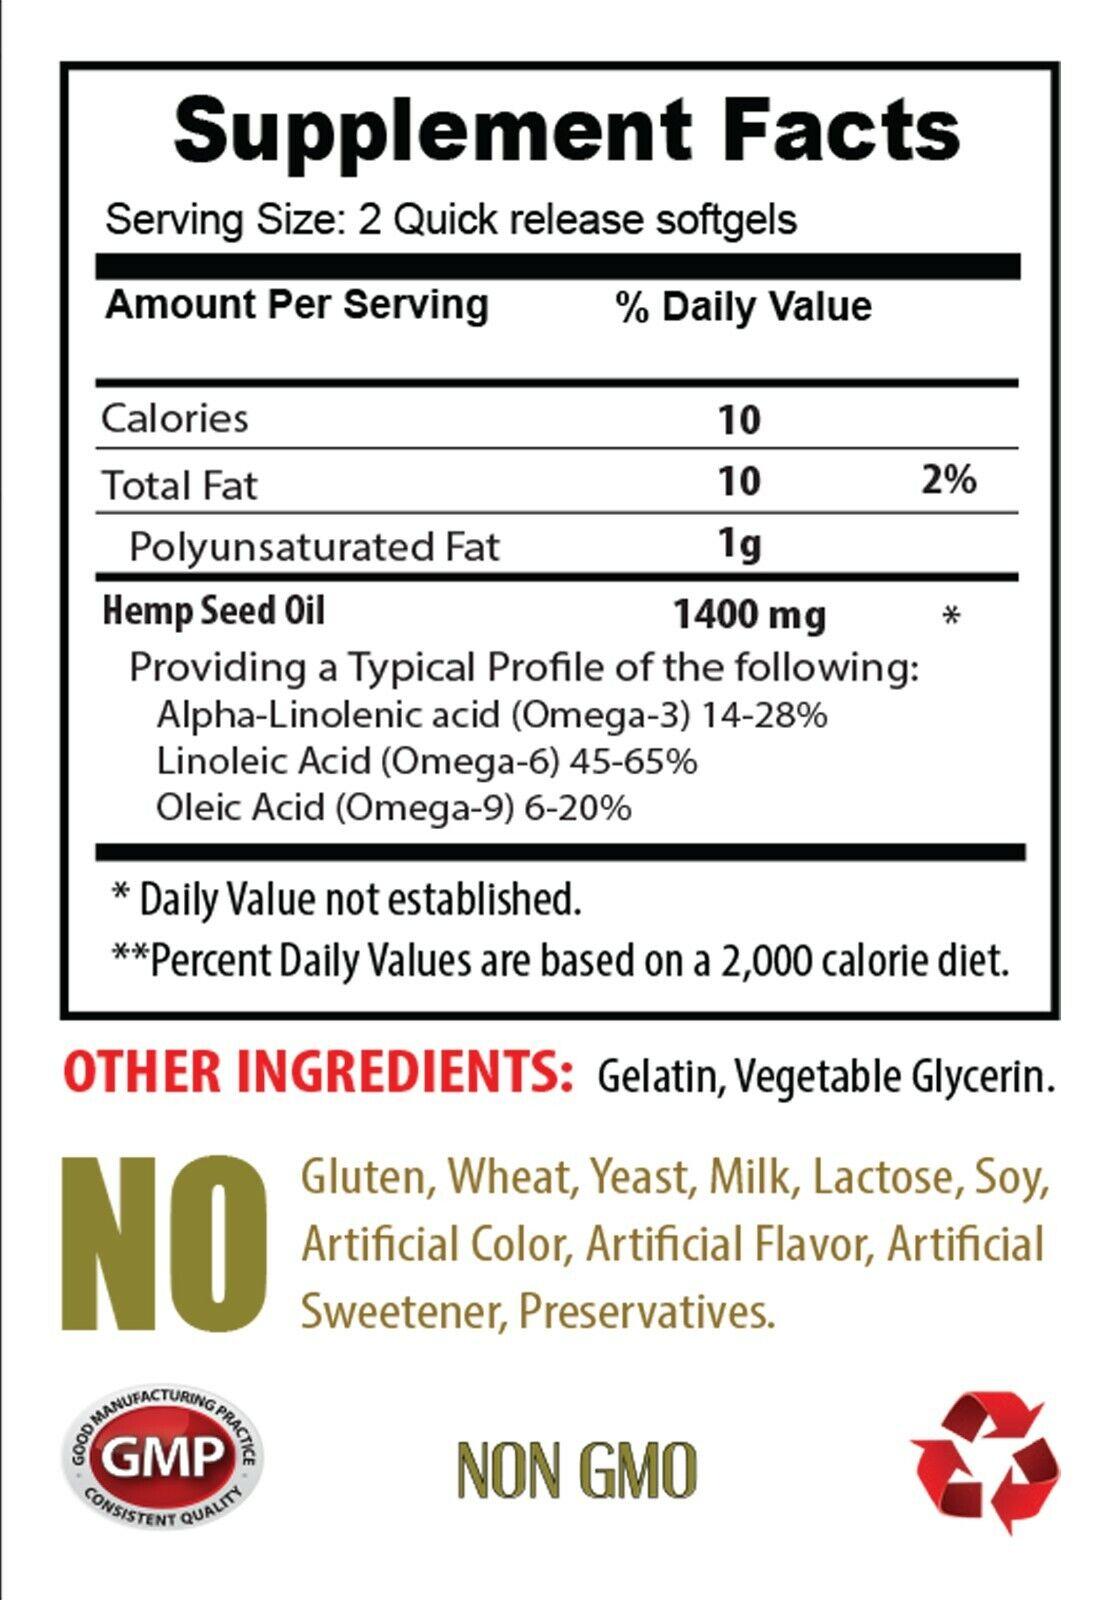 hemp oil for pain relief, ORGANIC HEMP SEED OIL 1400mg, omega acids 1 Bottle 1